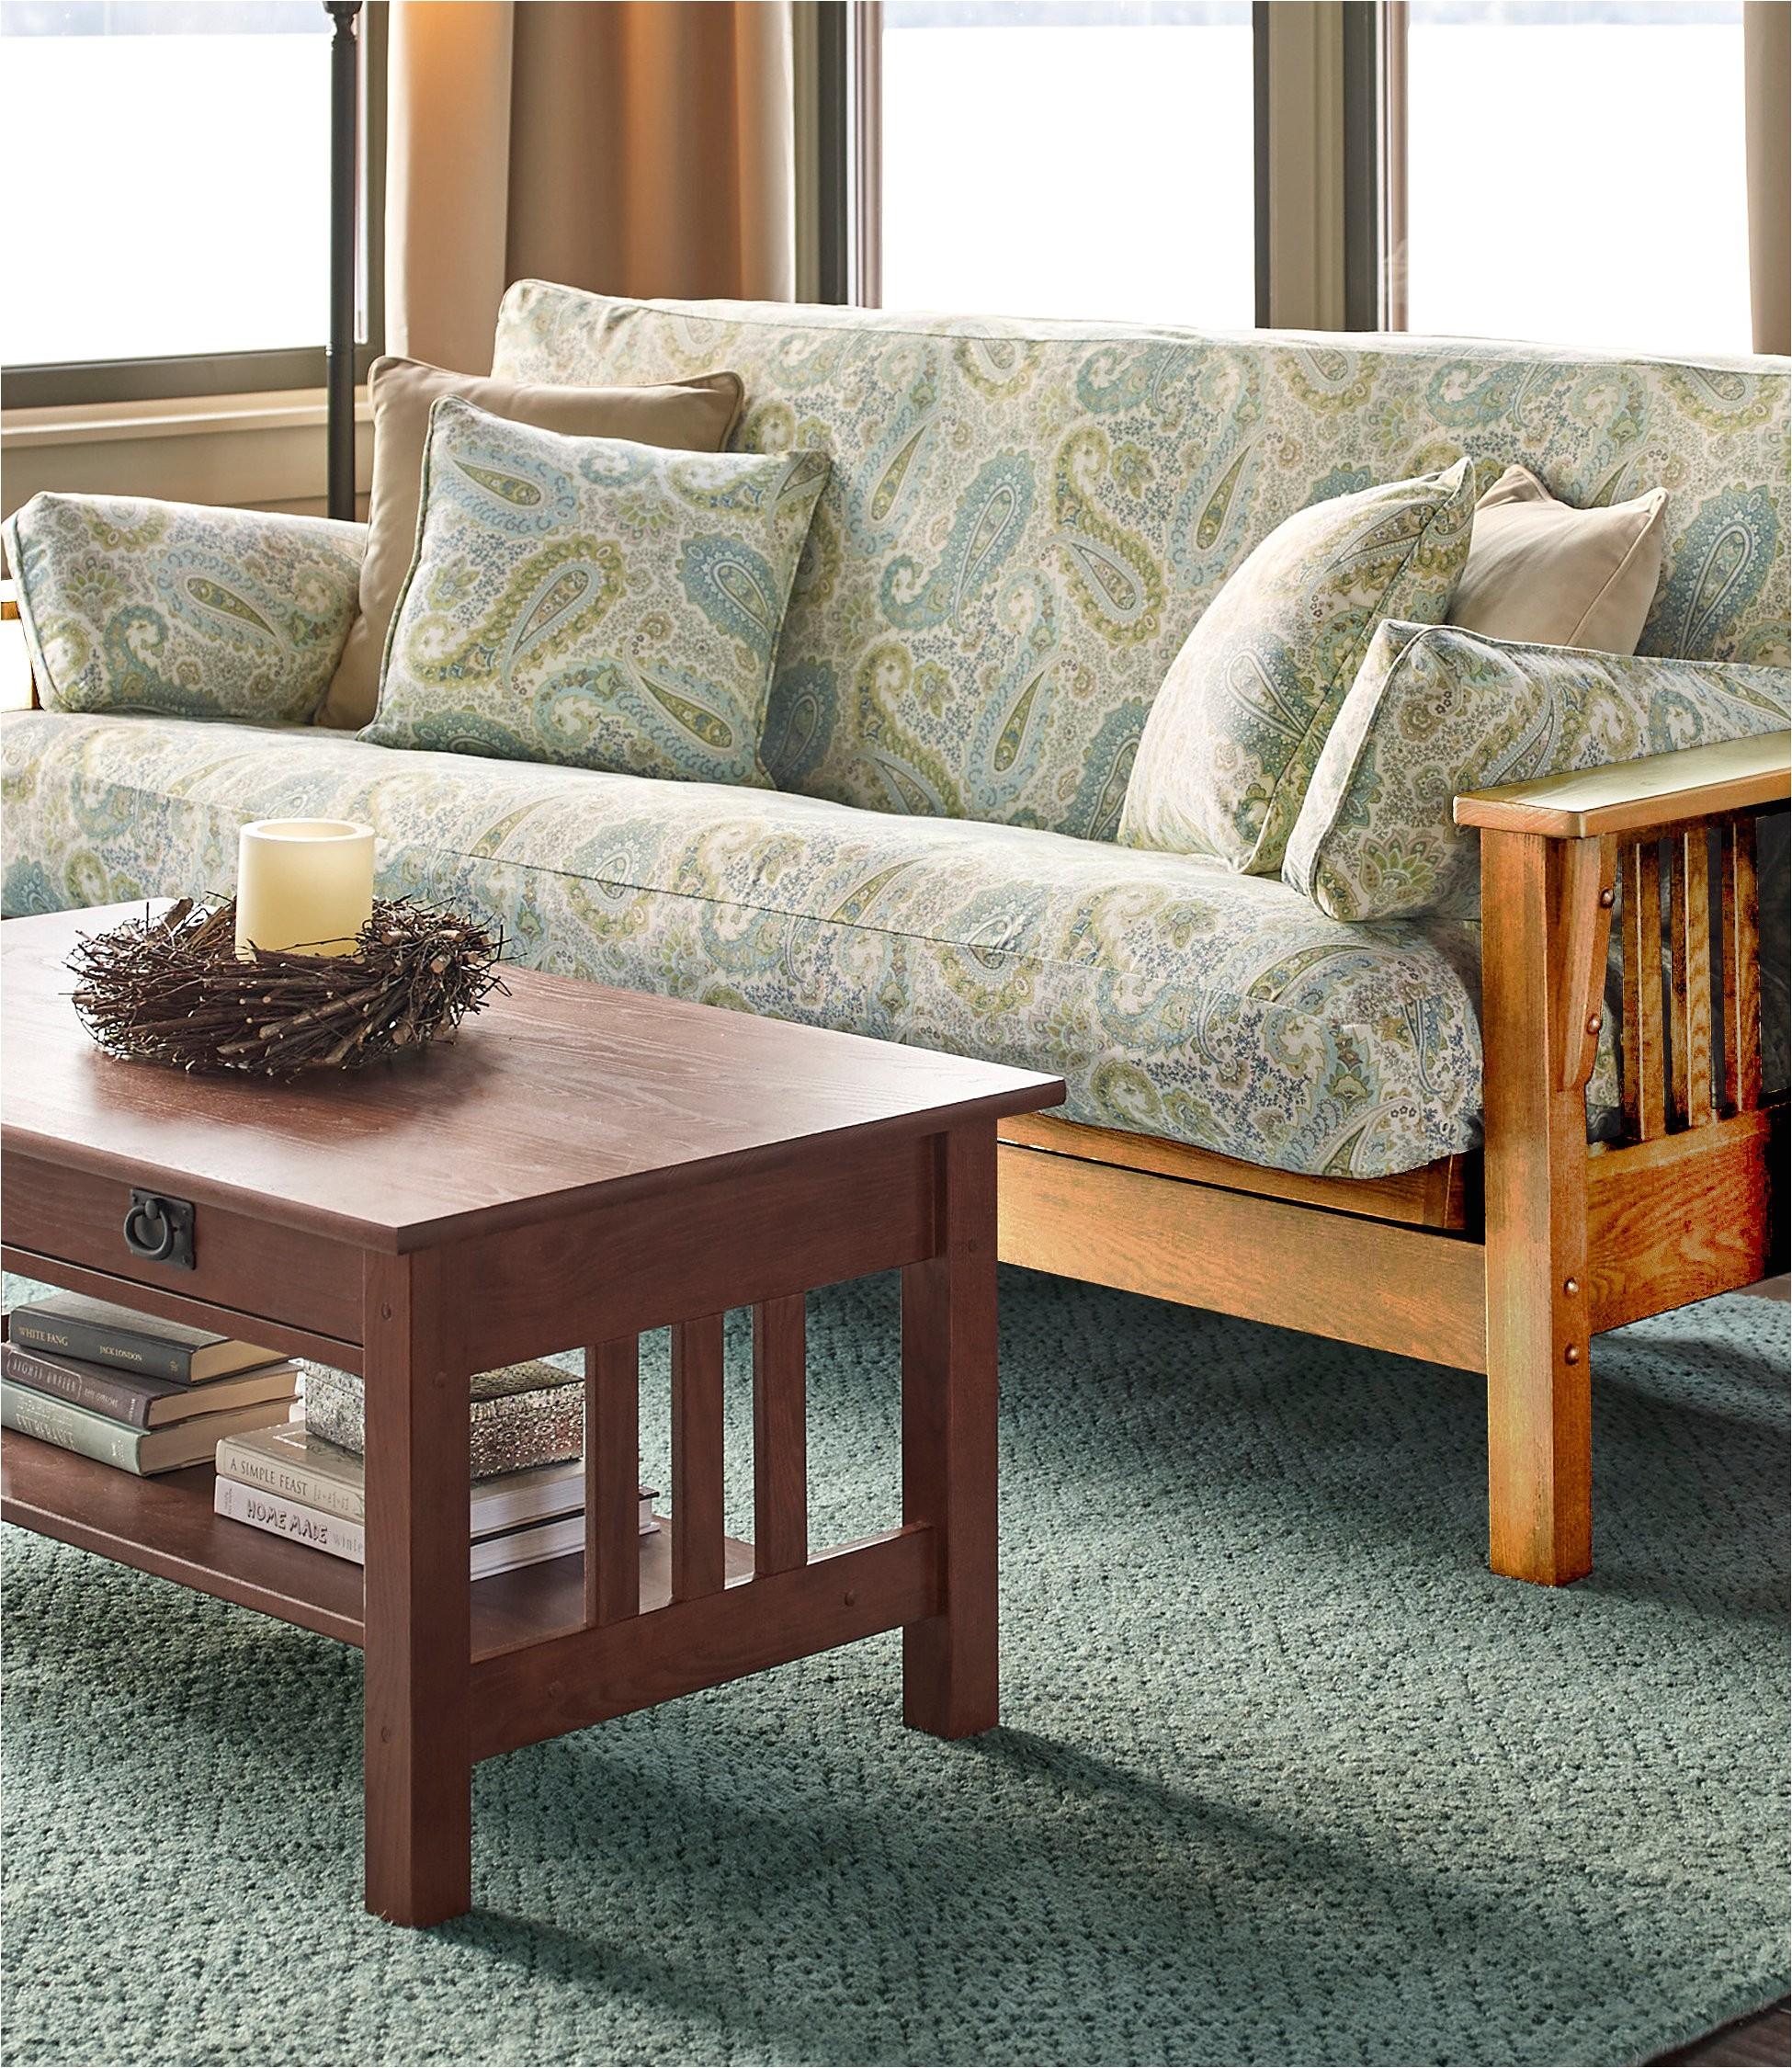 Inspirational Ll Bean sofa Sleeper Uncategorized Ll Bean sofa Covers Slipcovers Reviews Sleeper Futon